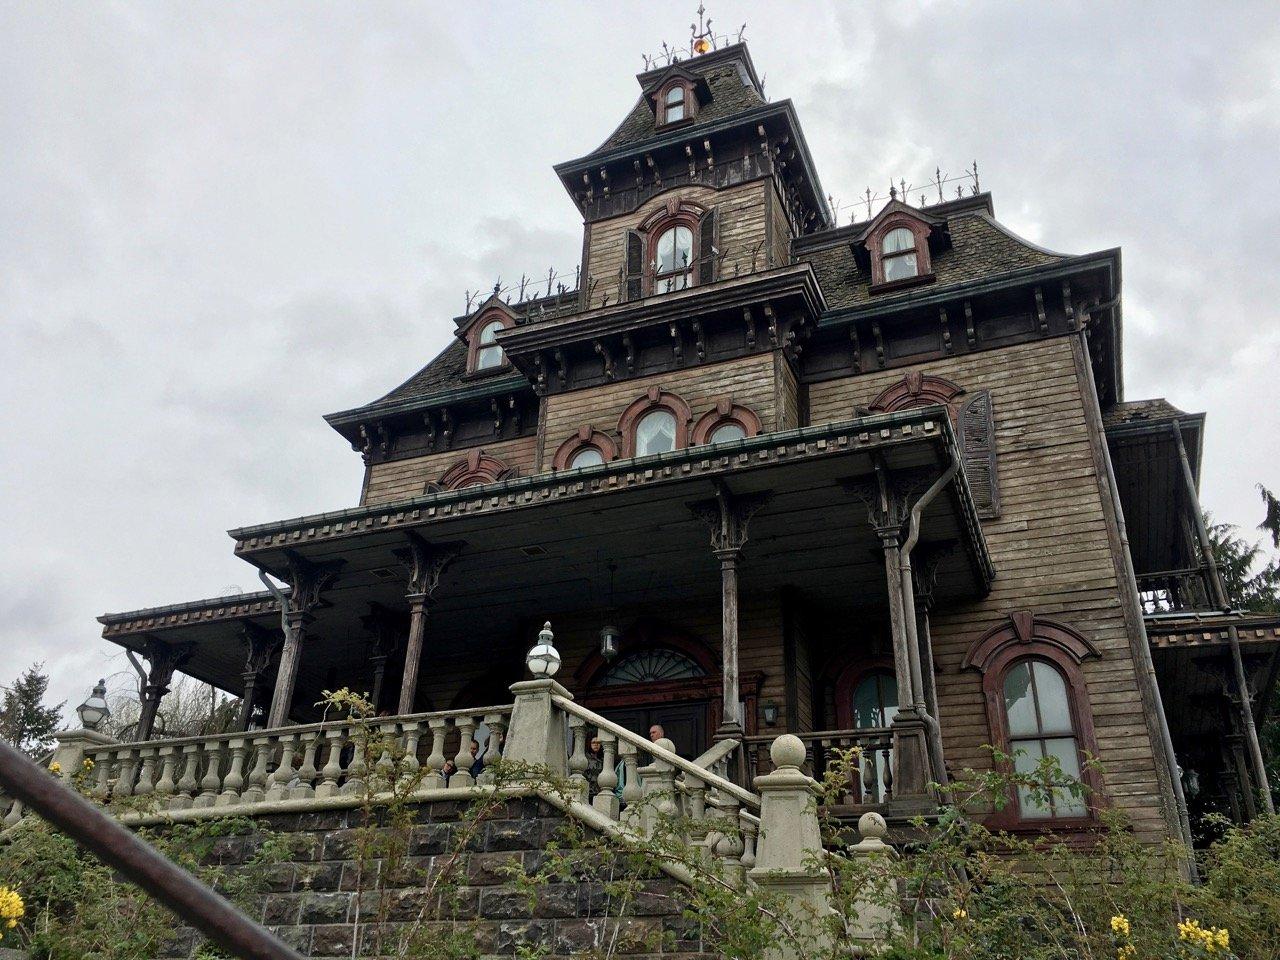 In Phantom Manor lehrt uns Disney das Gruseln